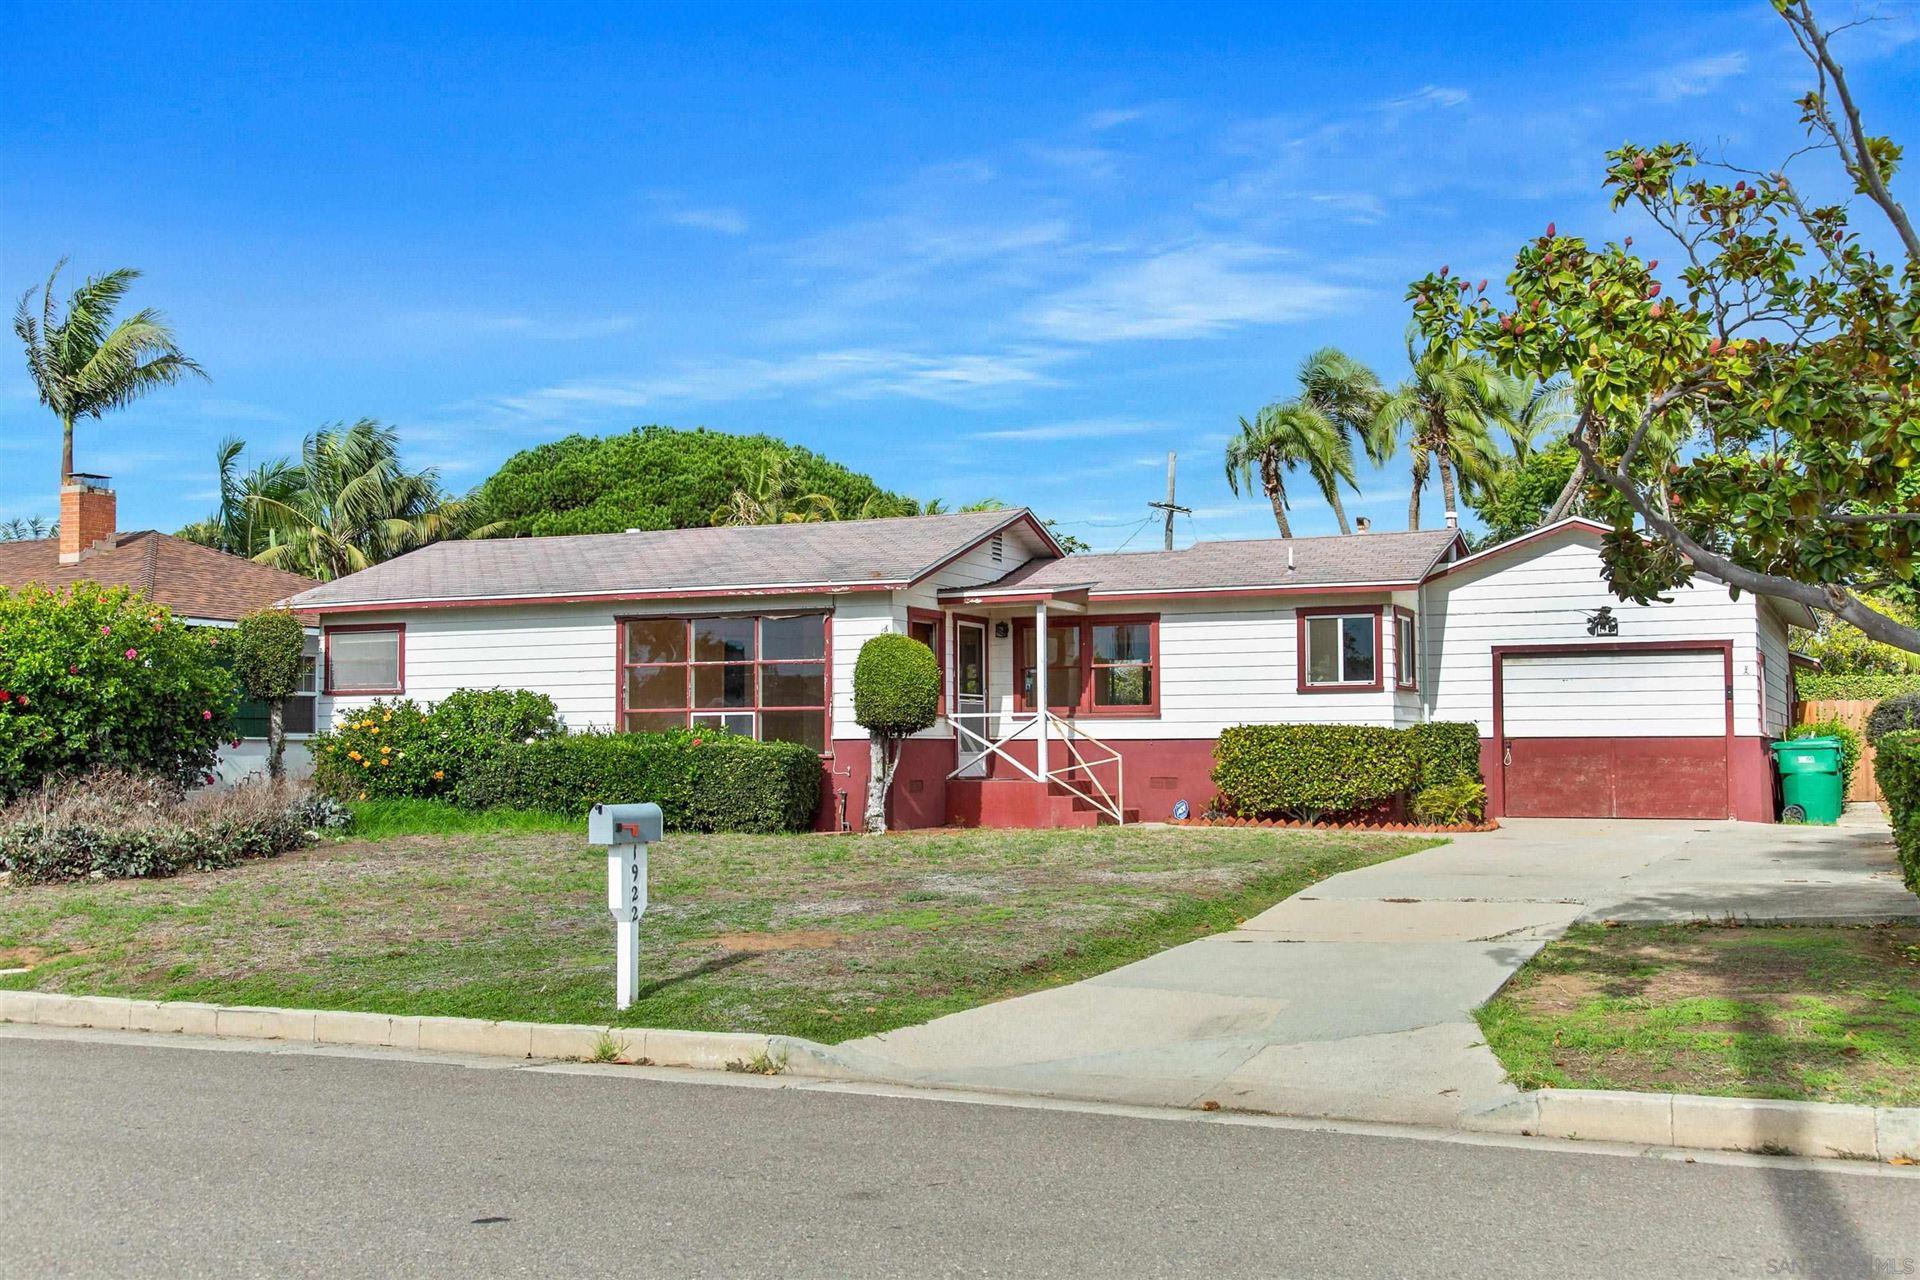 Photo of 1922 Lincoln St, Oceanside, CA 92054 (MLS # 210029482)